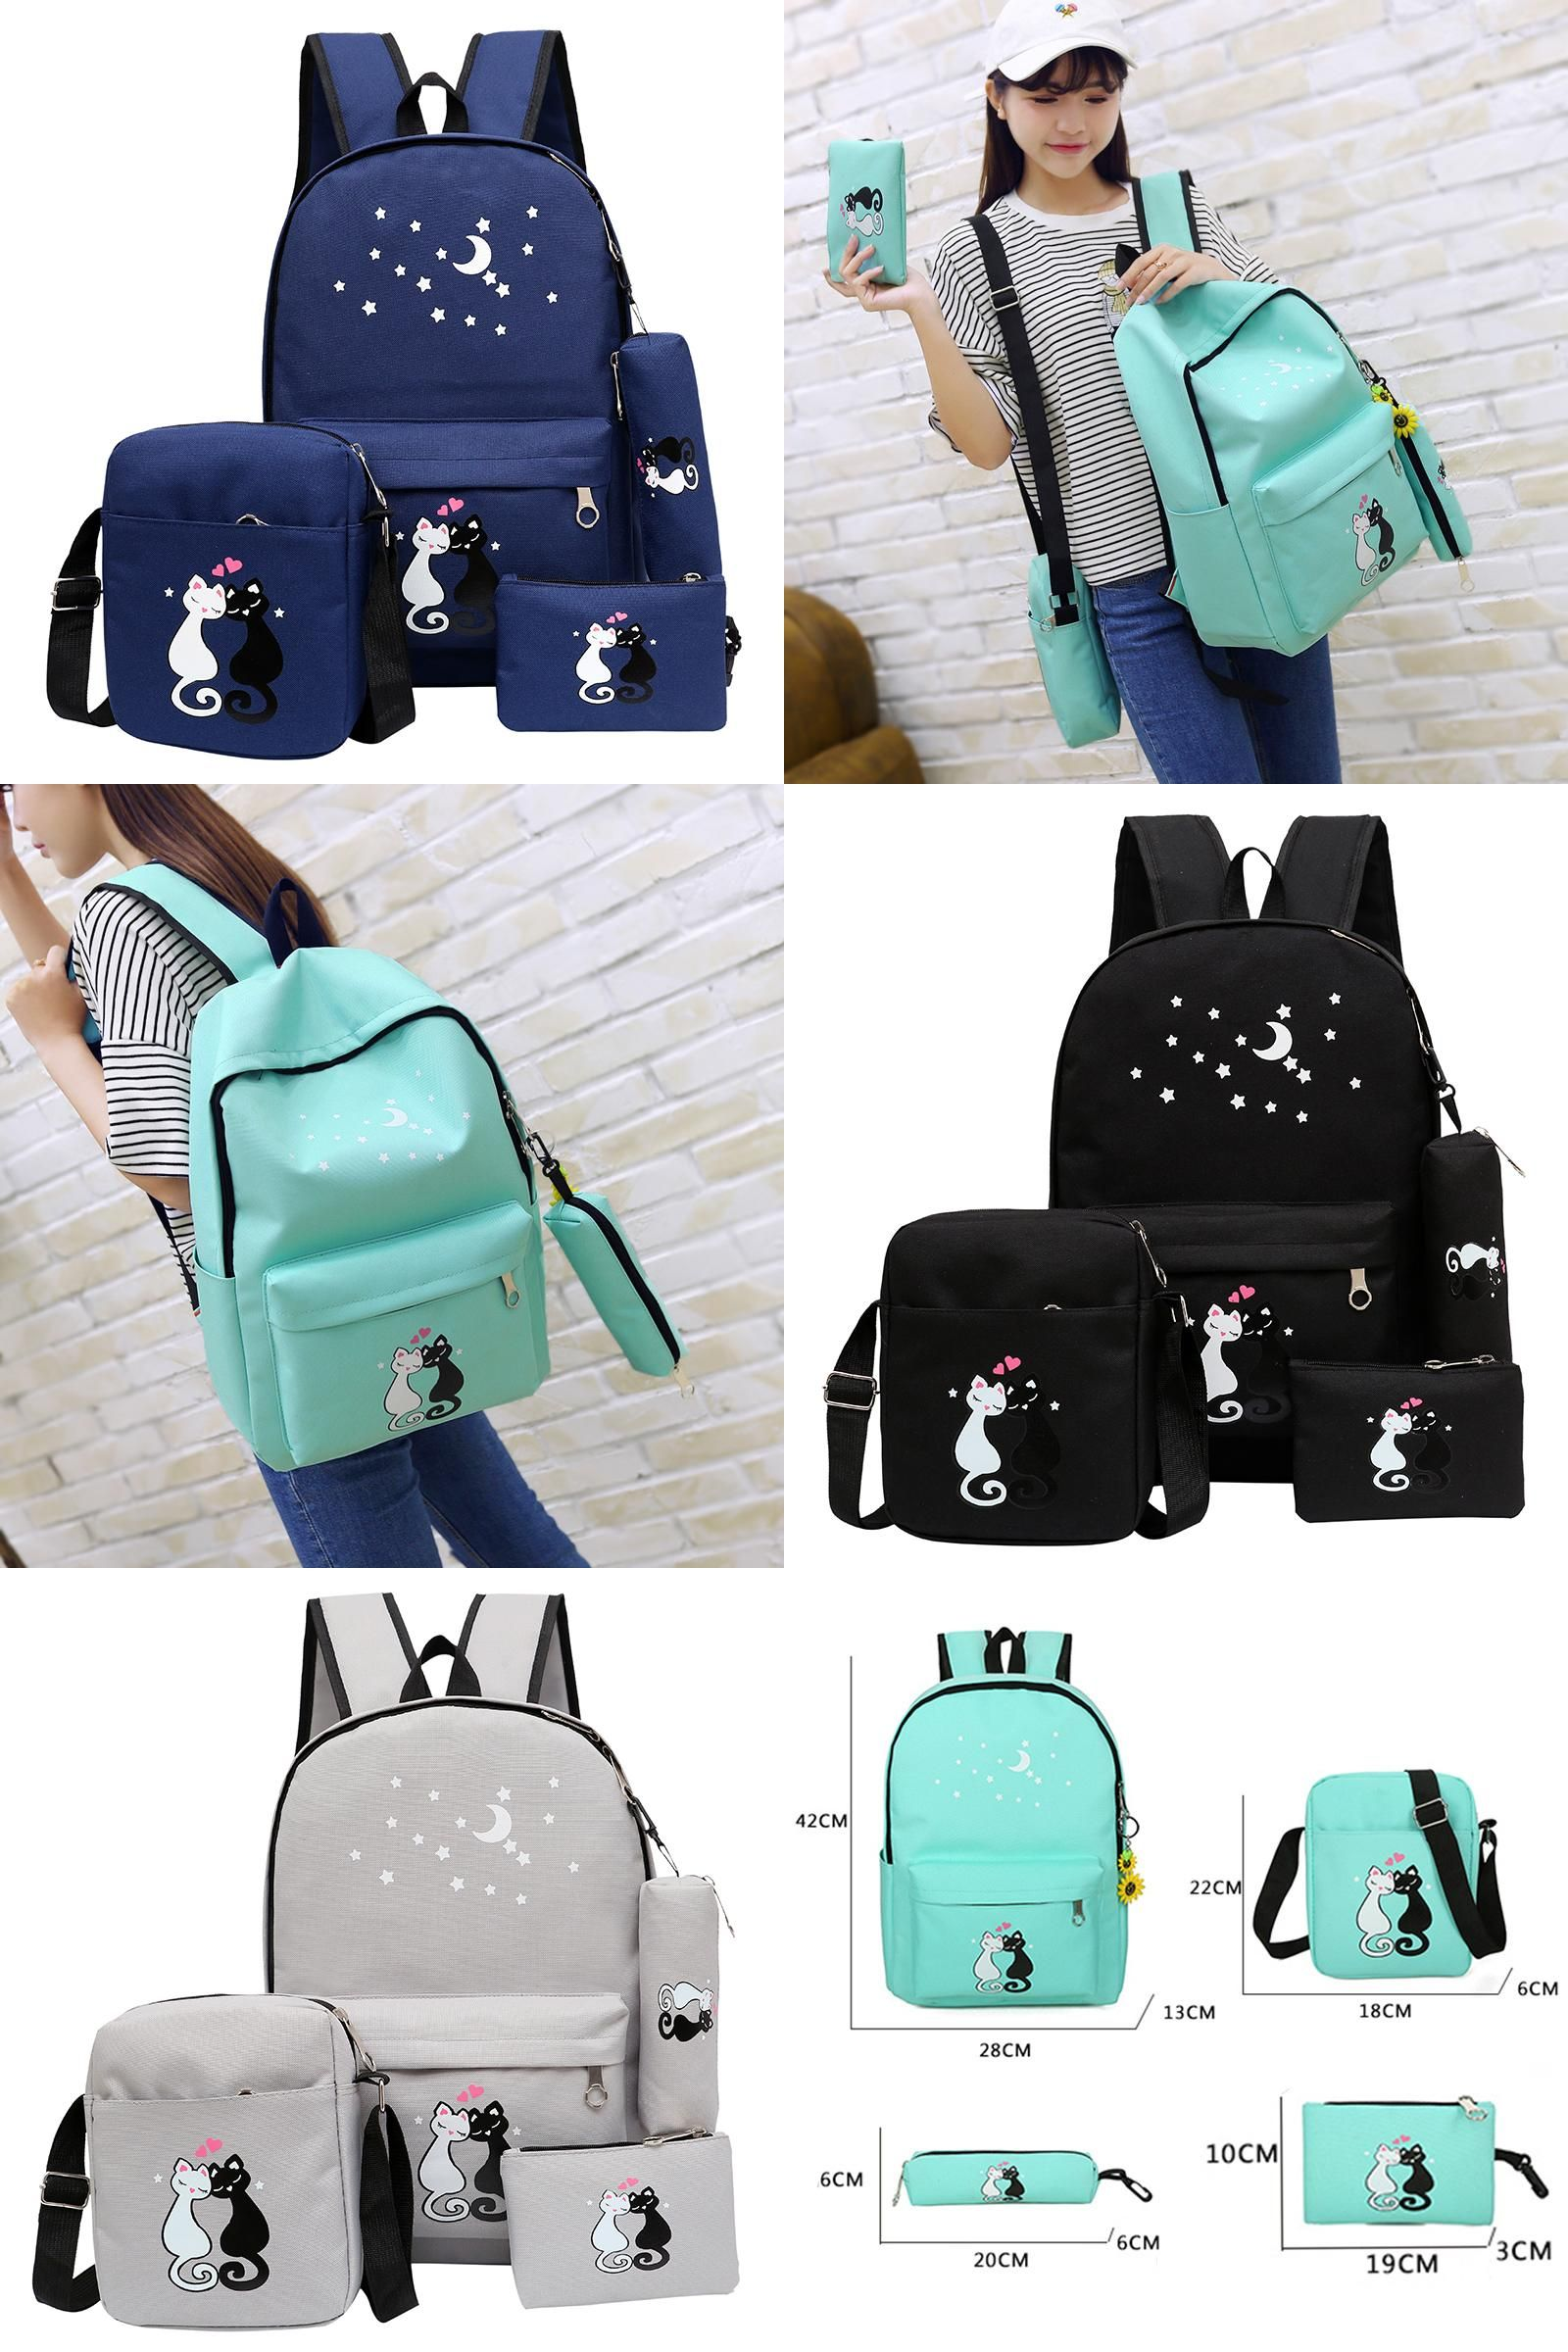 Visit to Buy  4Pcs set women backpack schoolbag korean rucksack cut school  bags 5c194d65118b1